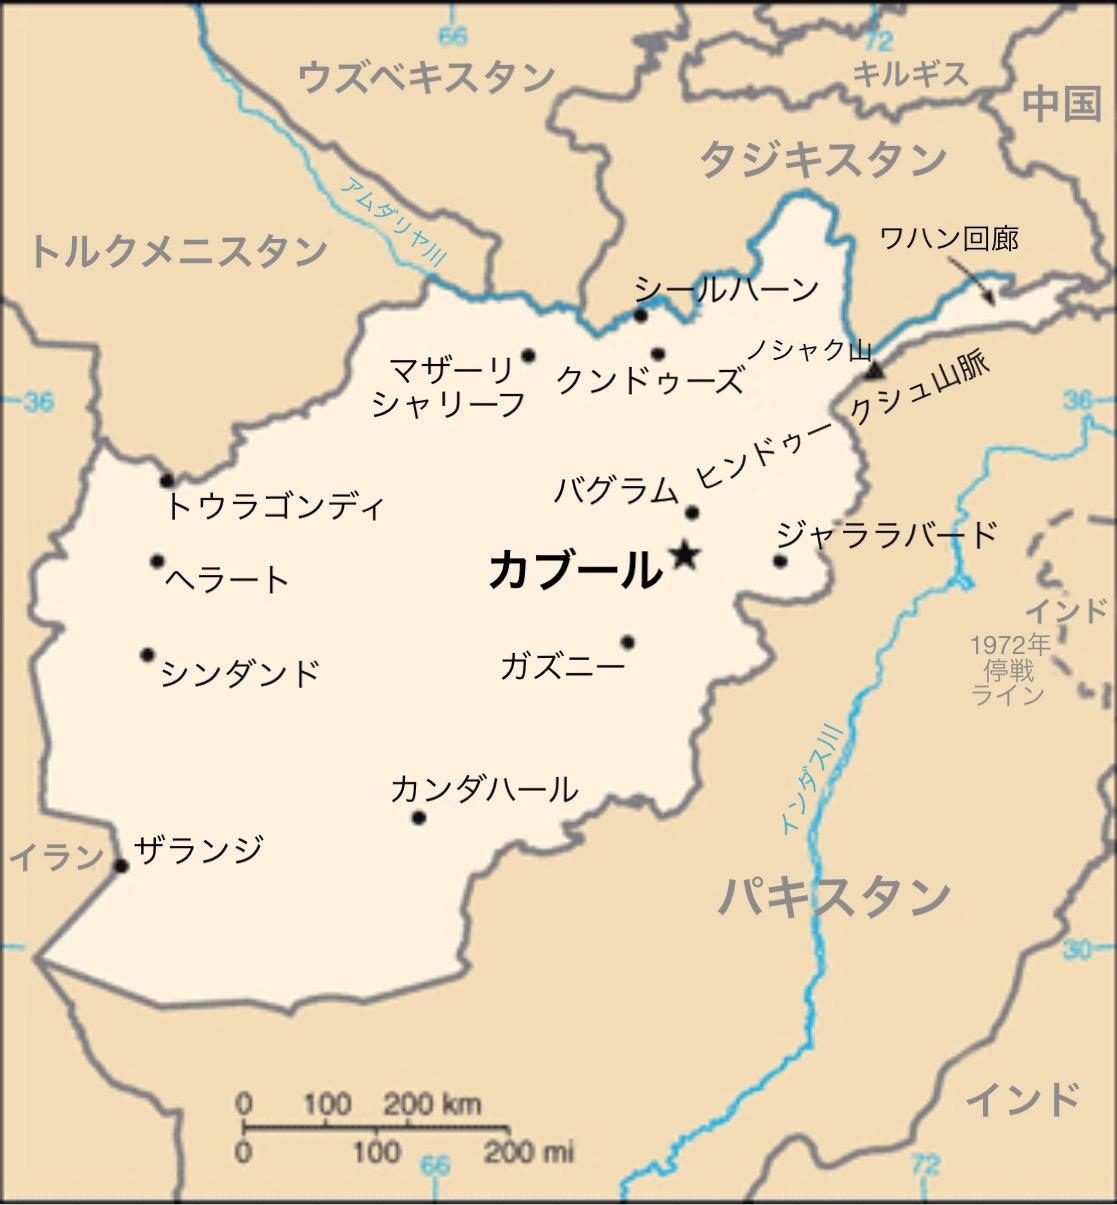 FileAfghanistanmapjajpeg Wikimedia Commons - Where is kabul